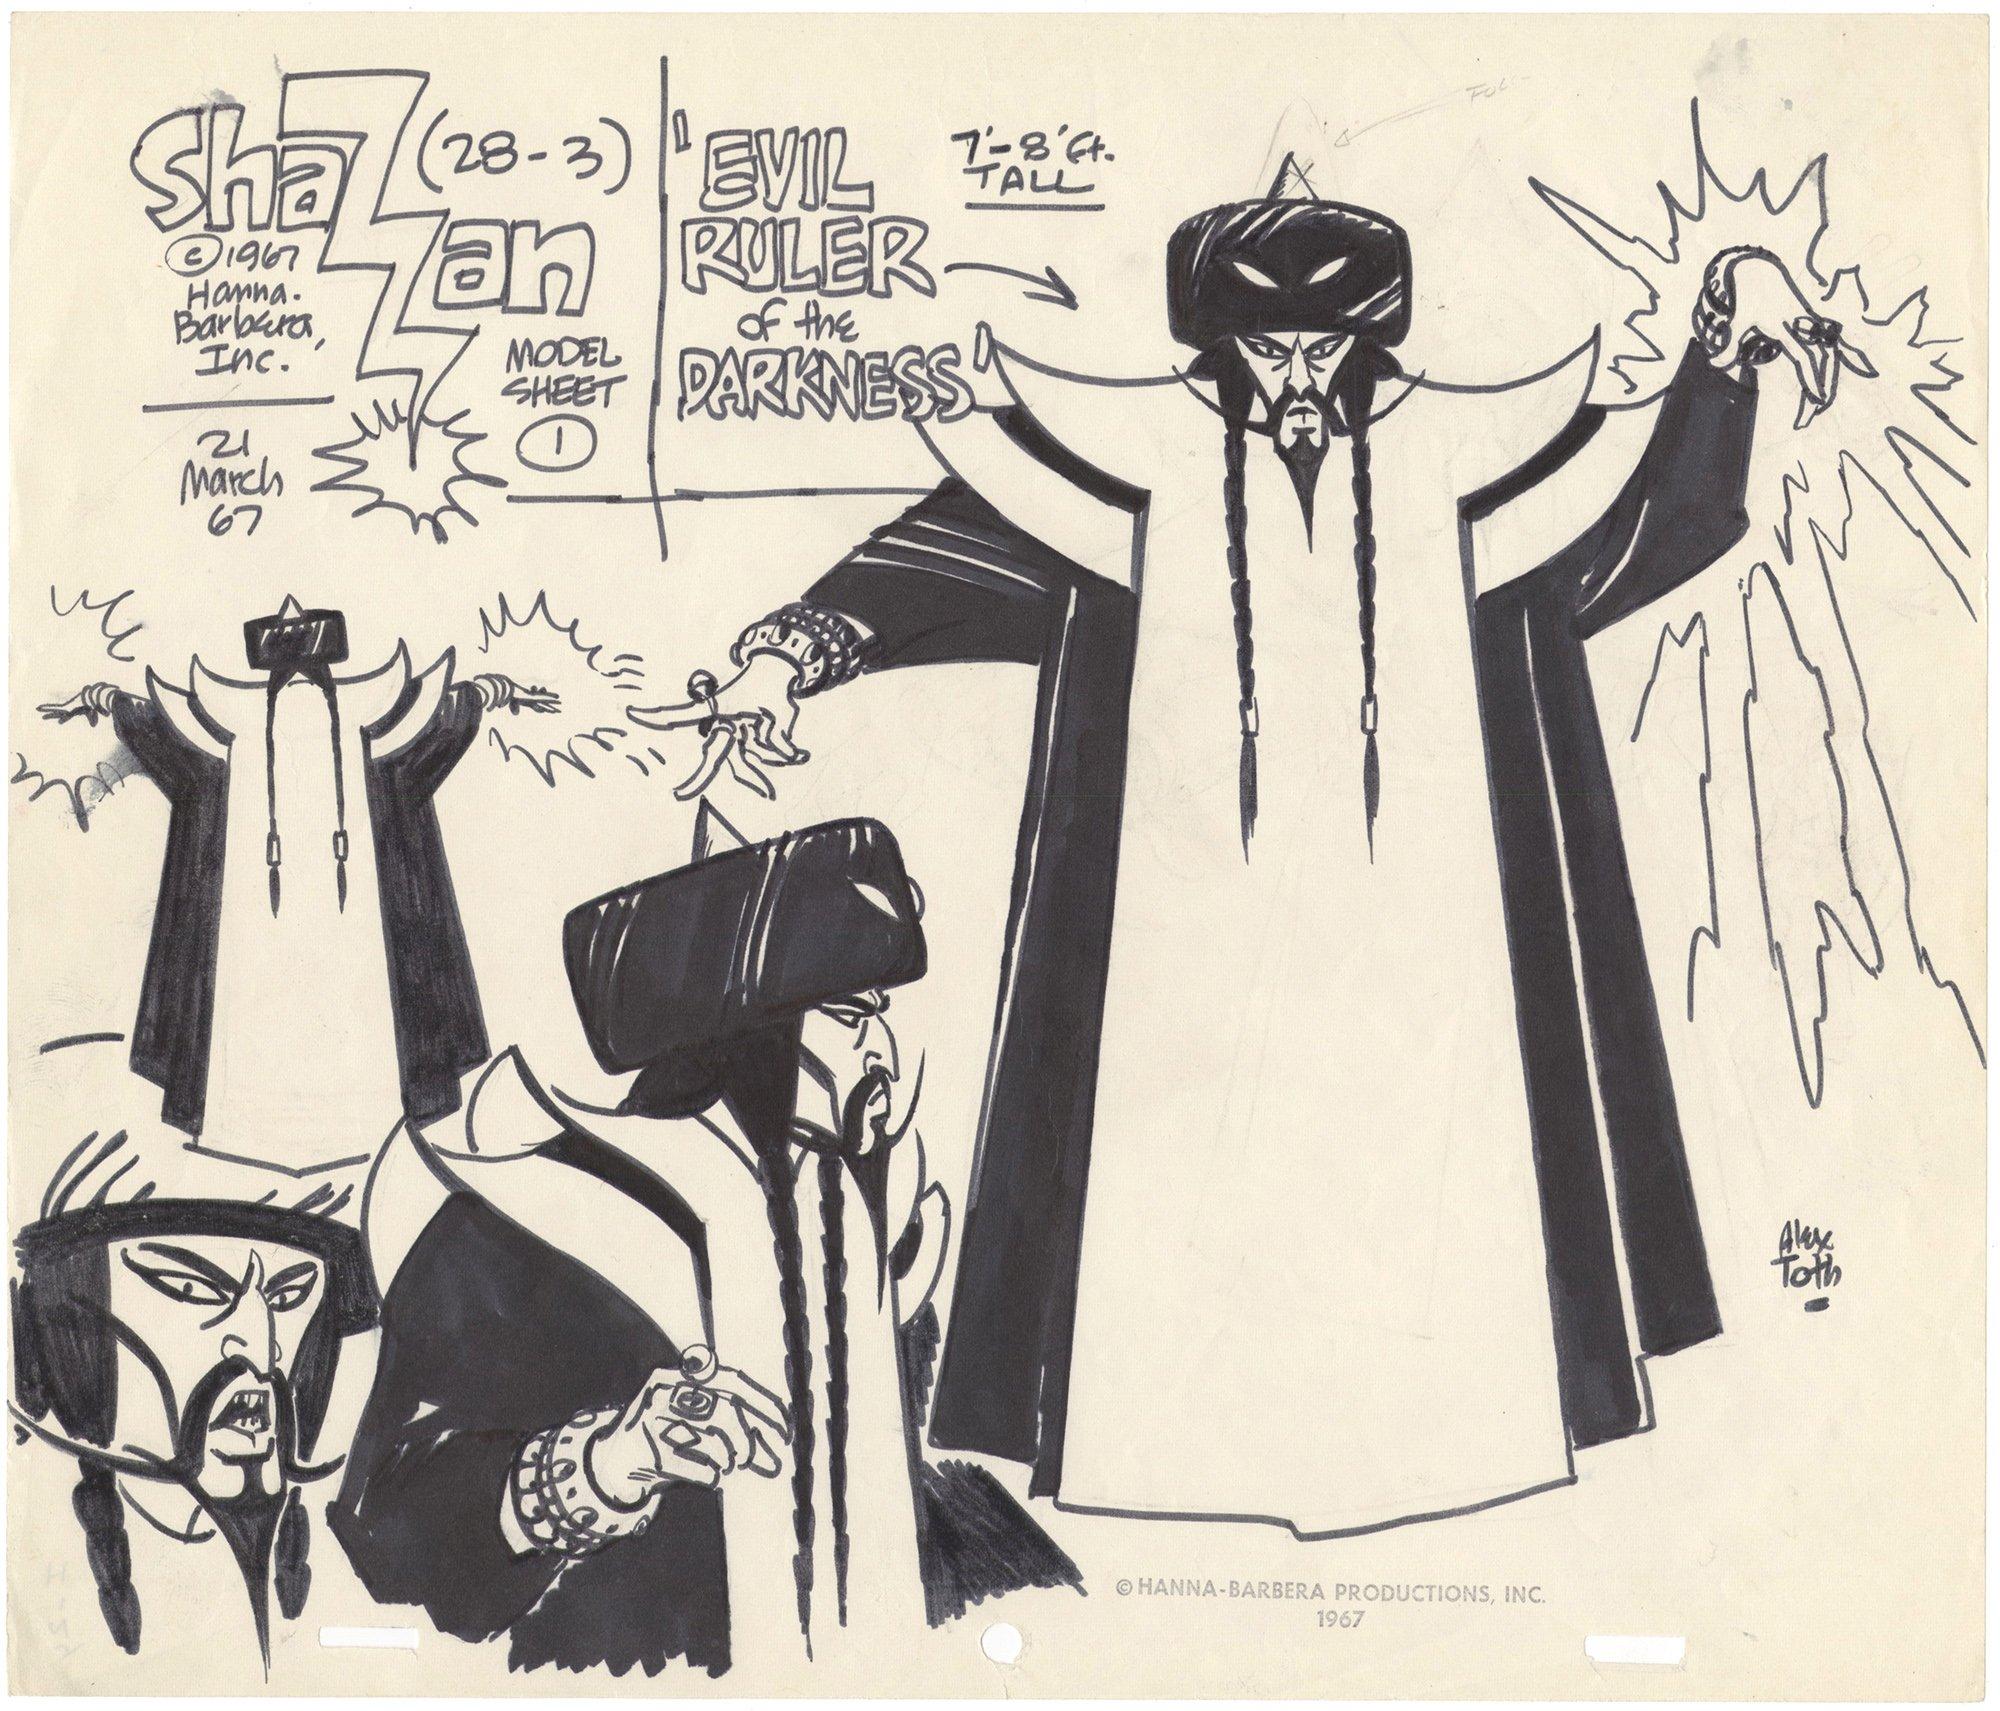 Shazzan Model Sheet Hanna-Barbera Inc. (28-3)